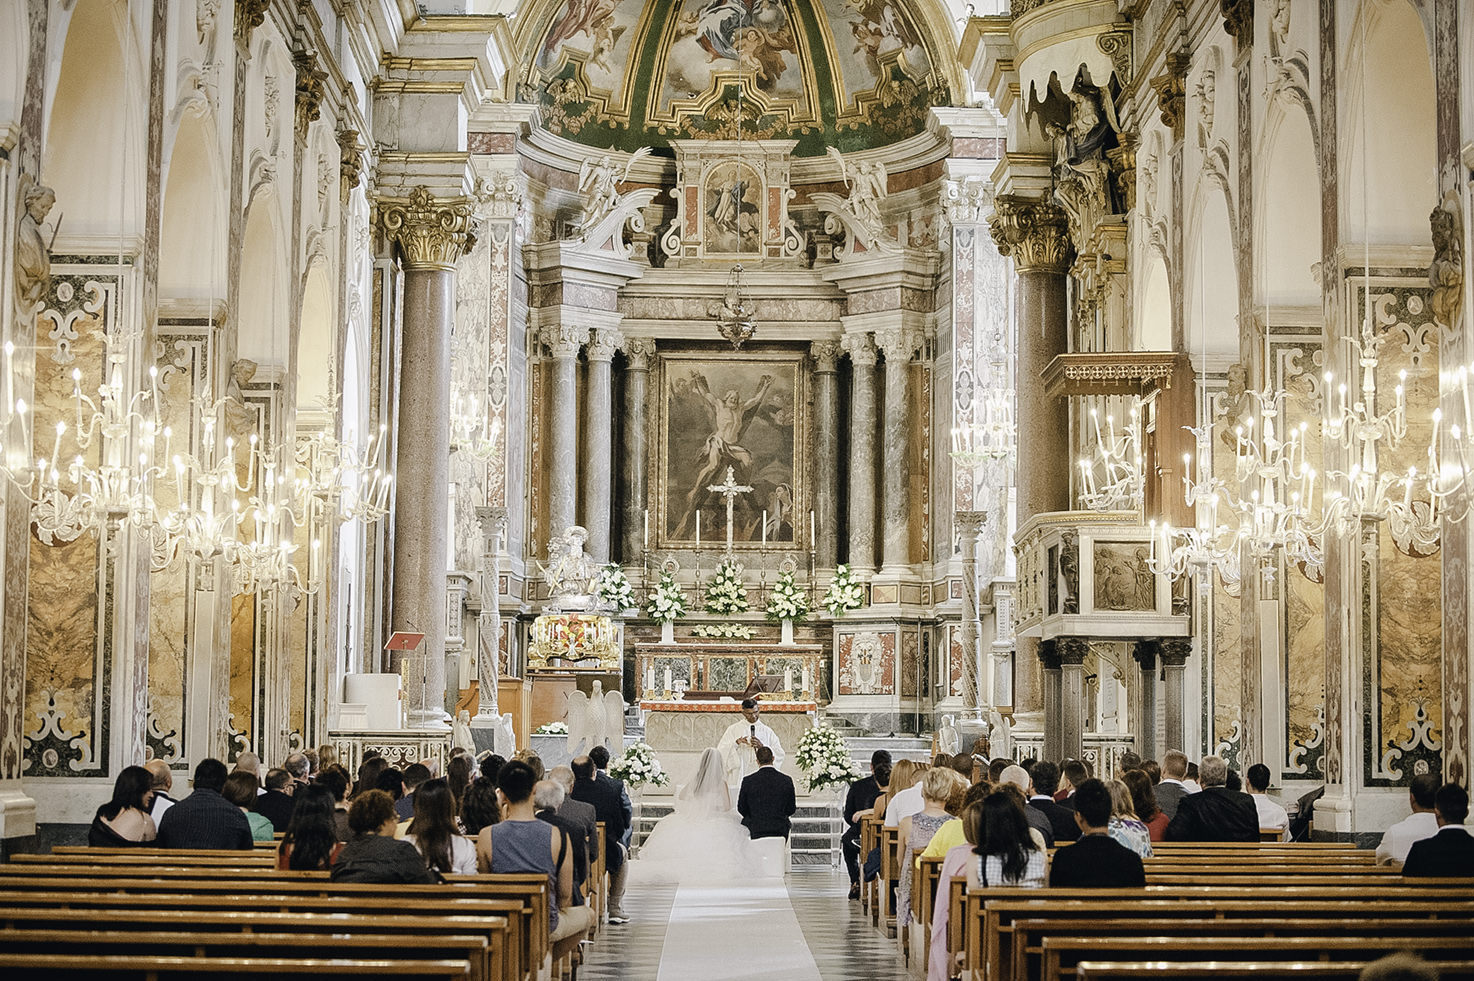 Interior of Amalfi Duomo